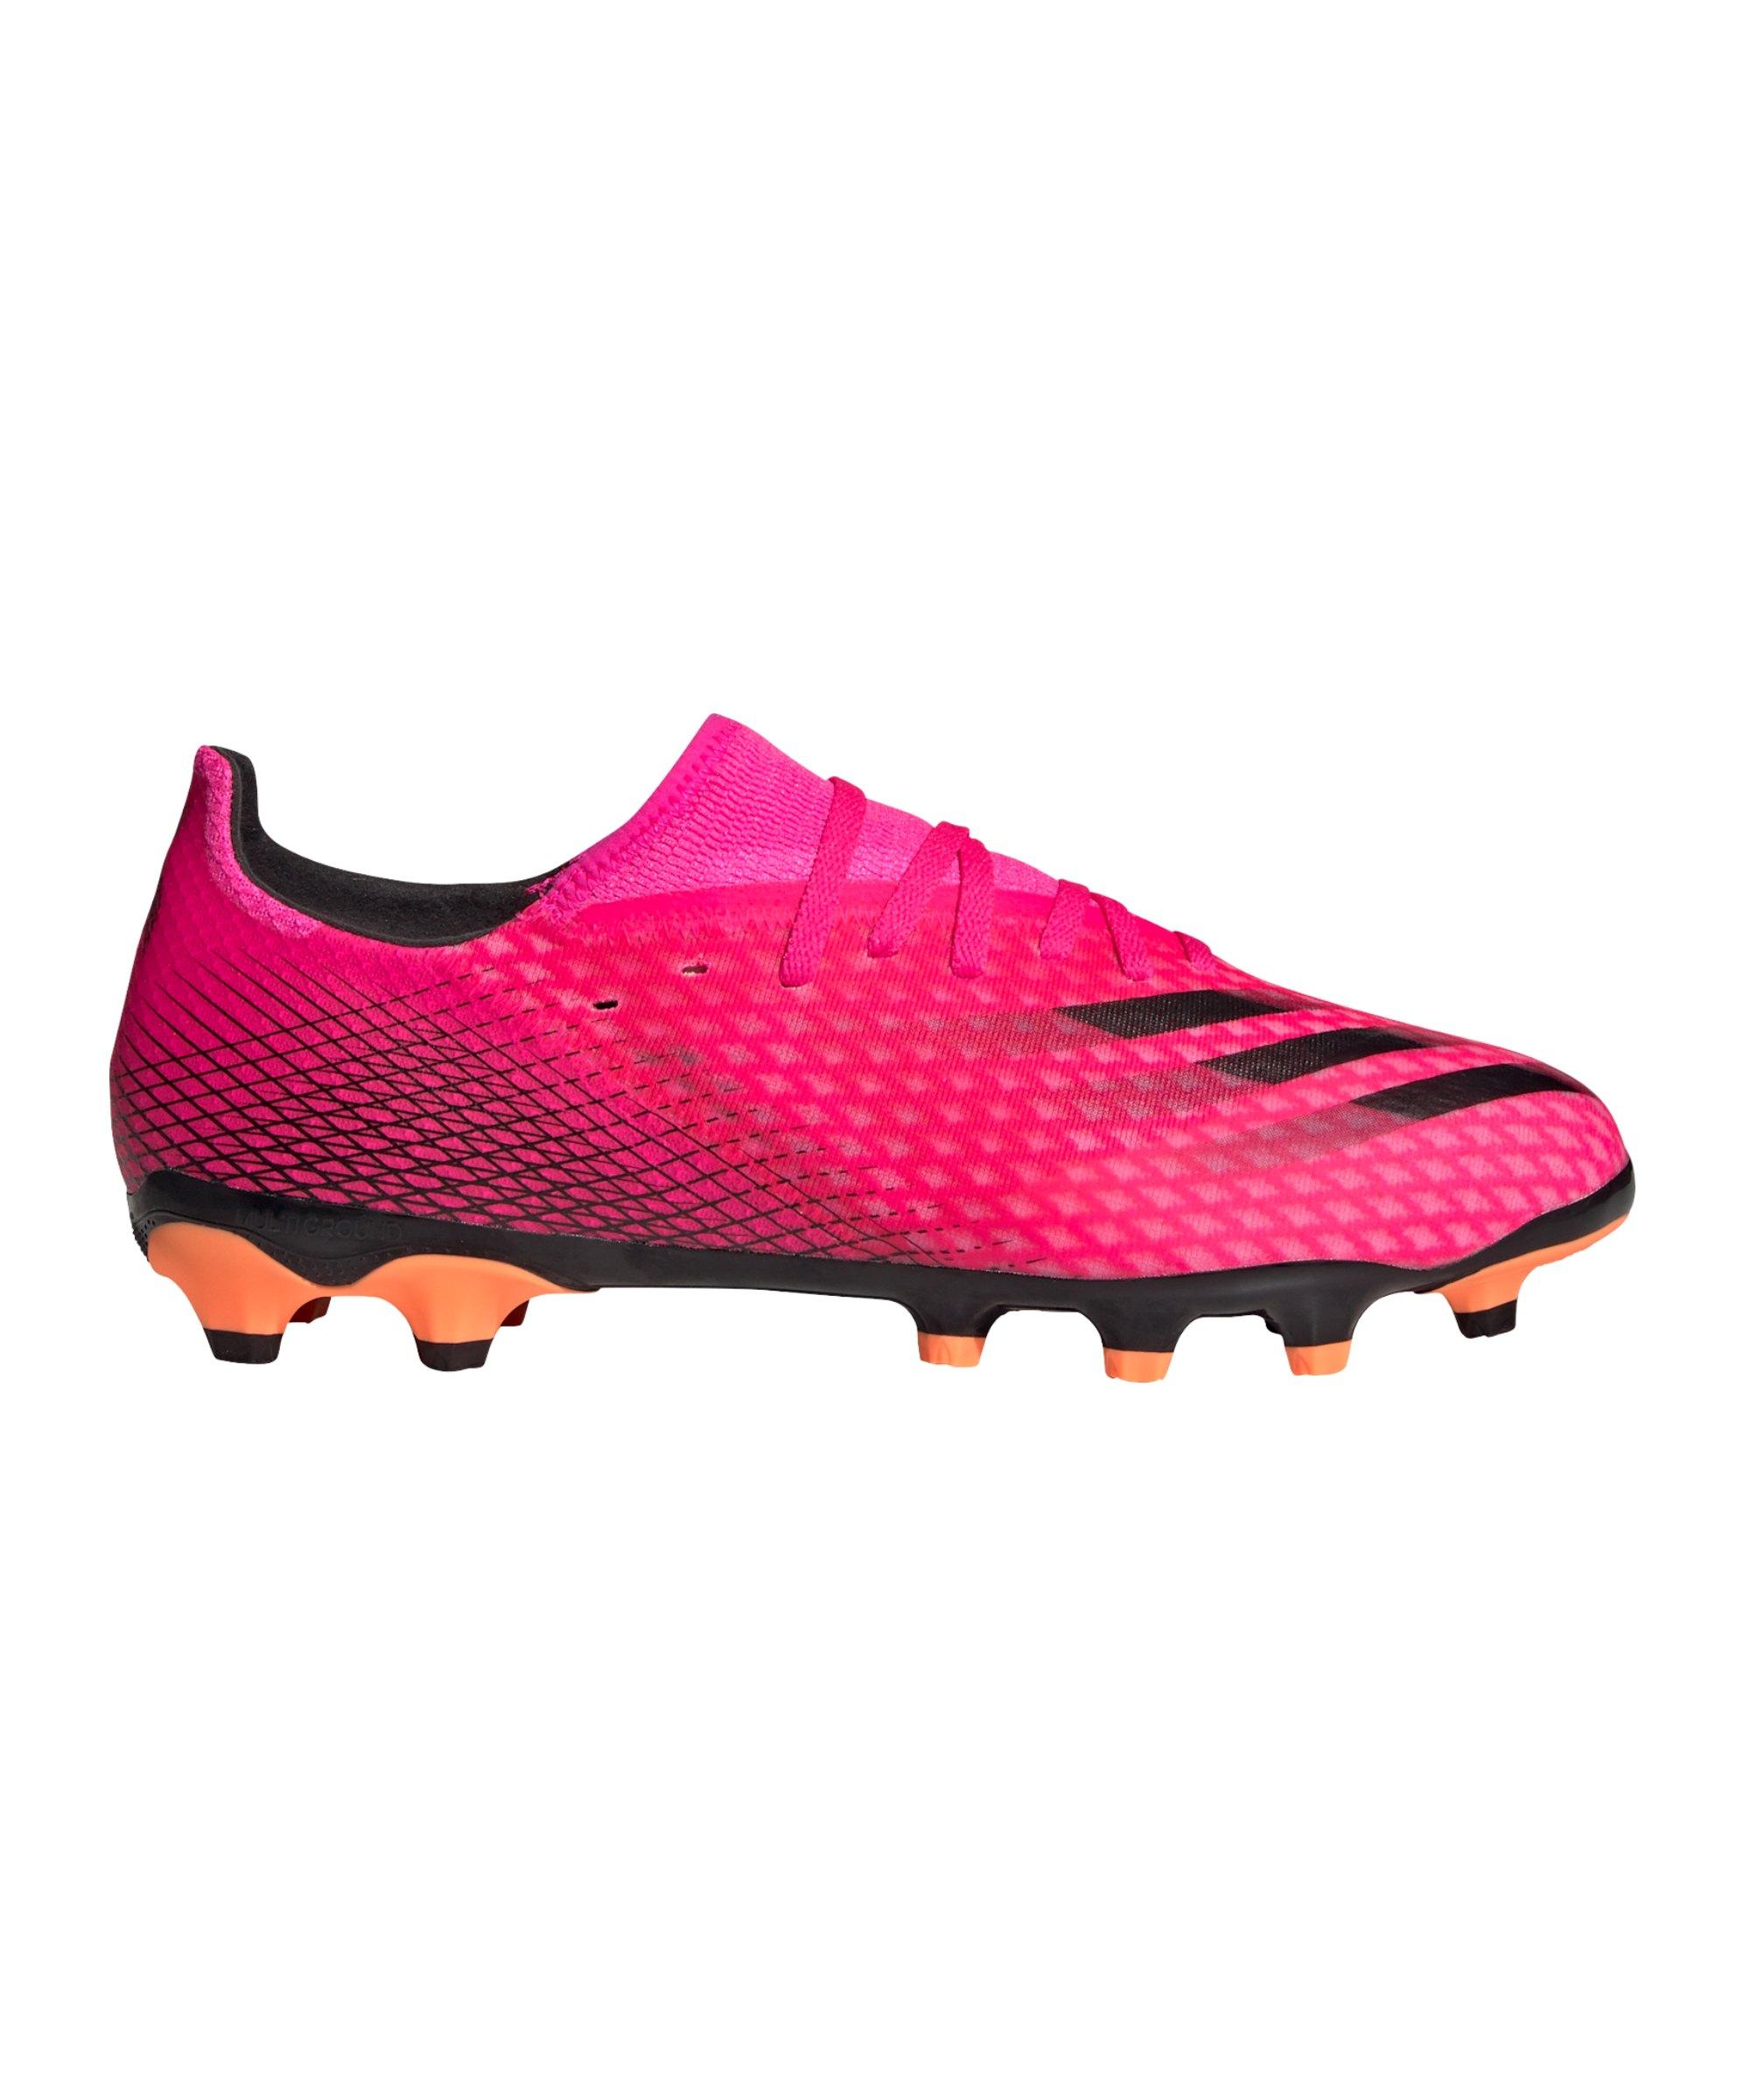 adidas X GHOSTED.3 MG Superspectral Pink Schwarz Orange - pink